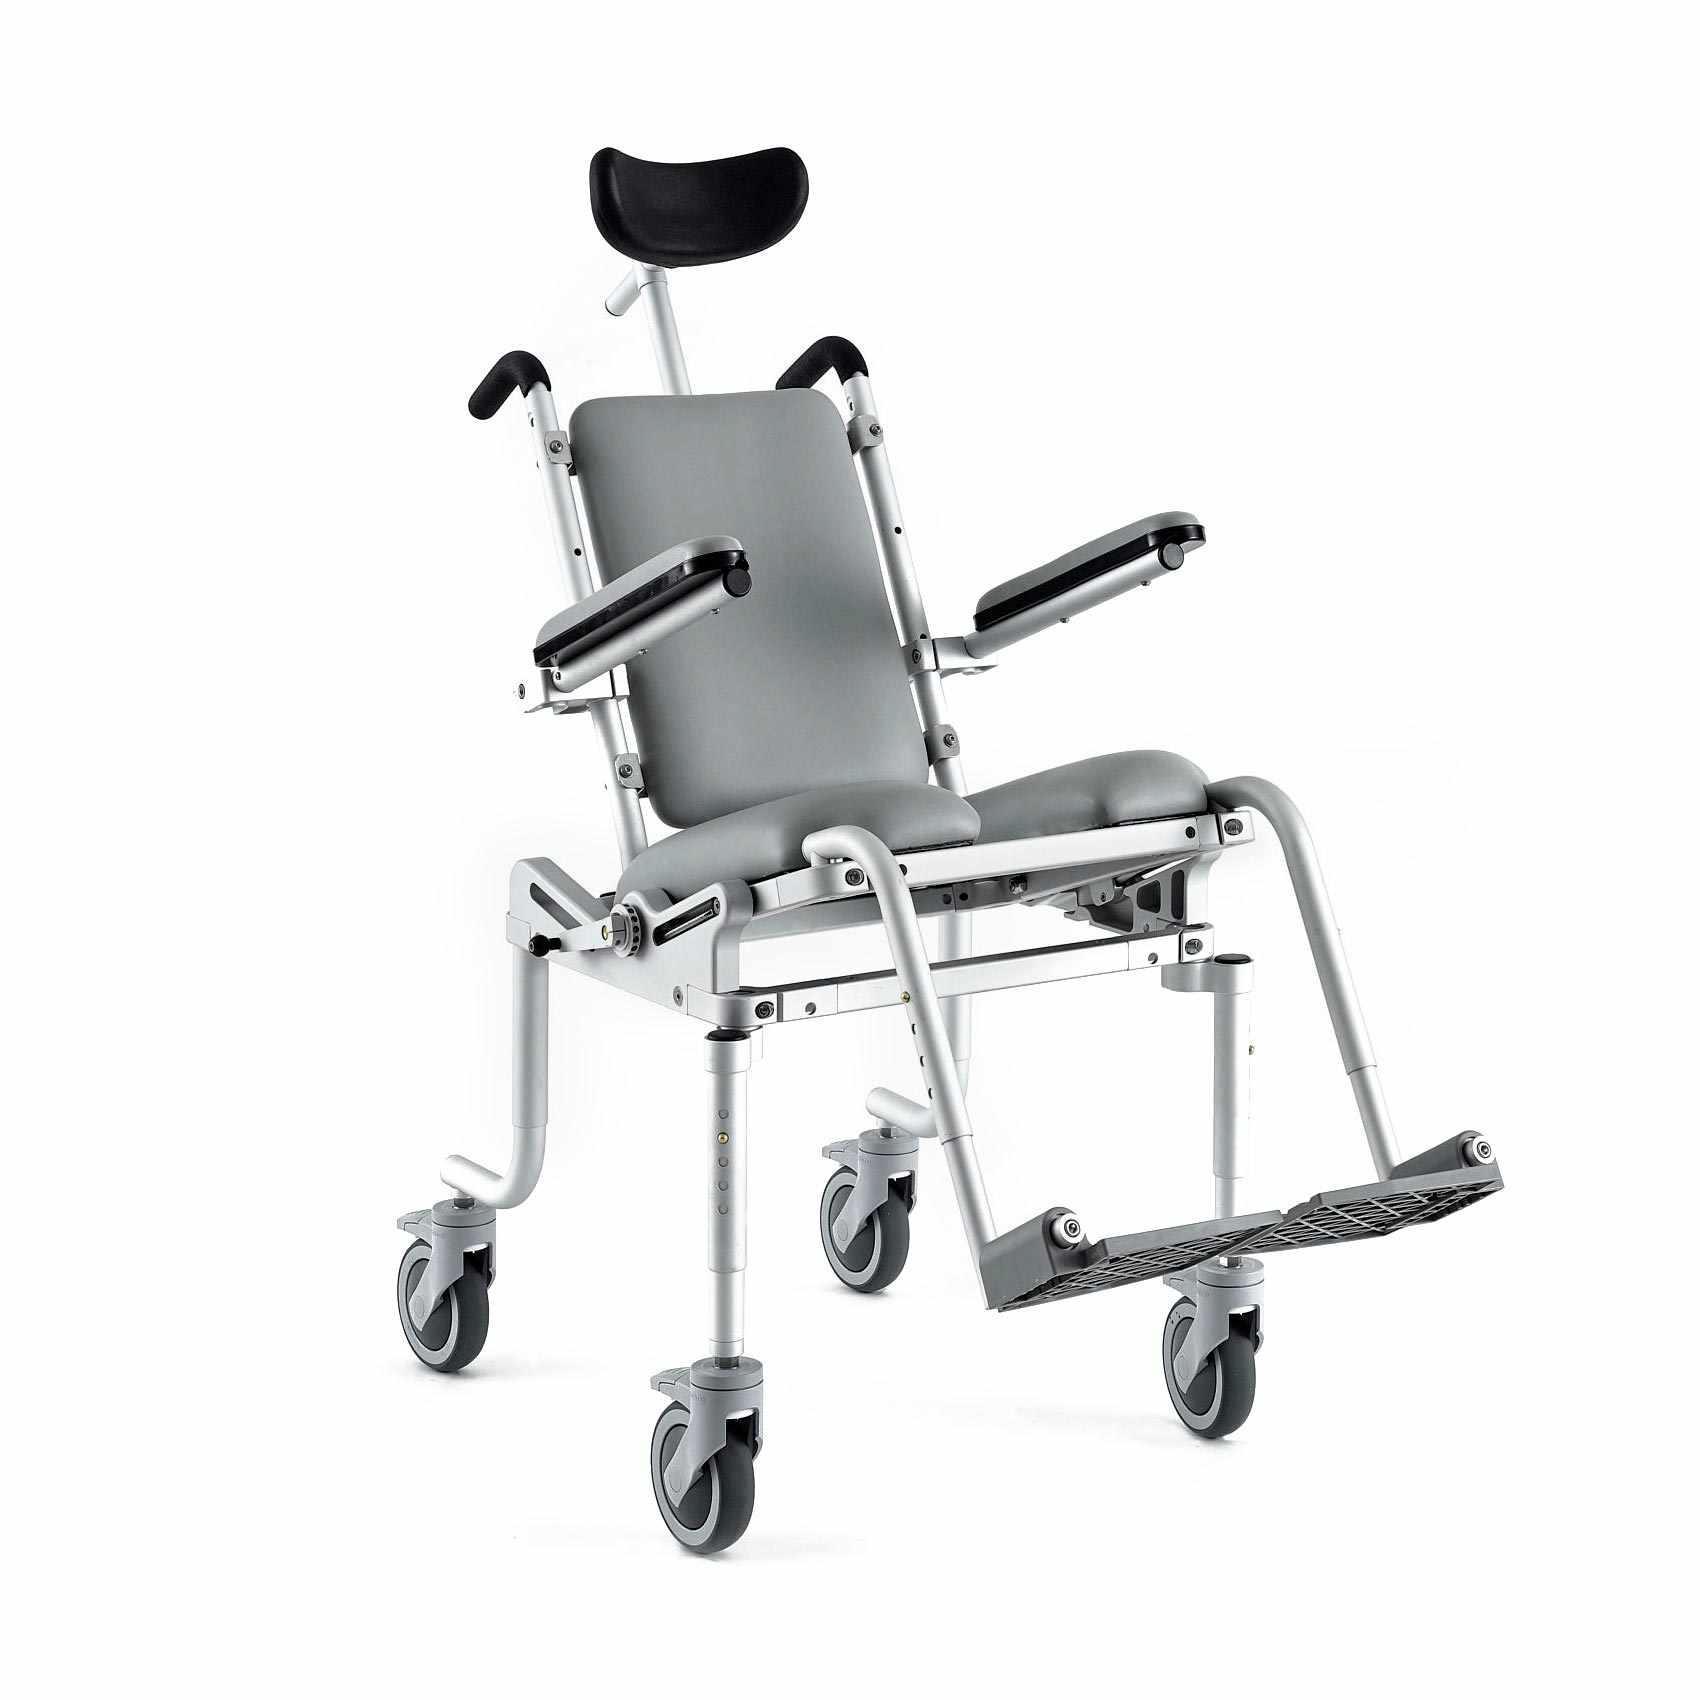 Nuprodx Multichair 4000Tilt Pediatric Roll-In-Shower Commode Chair